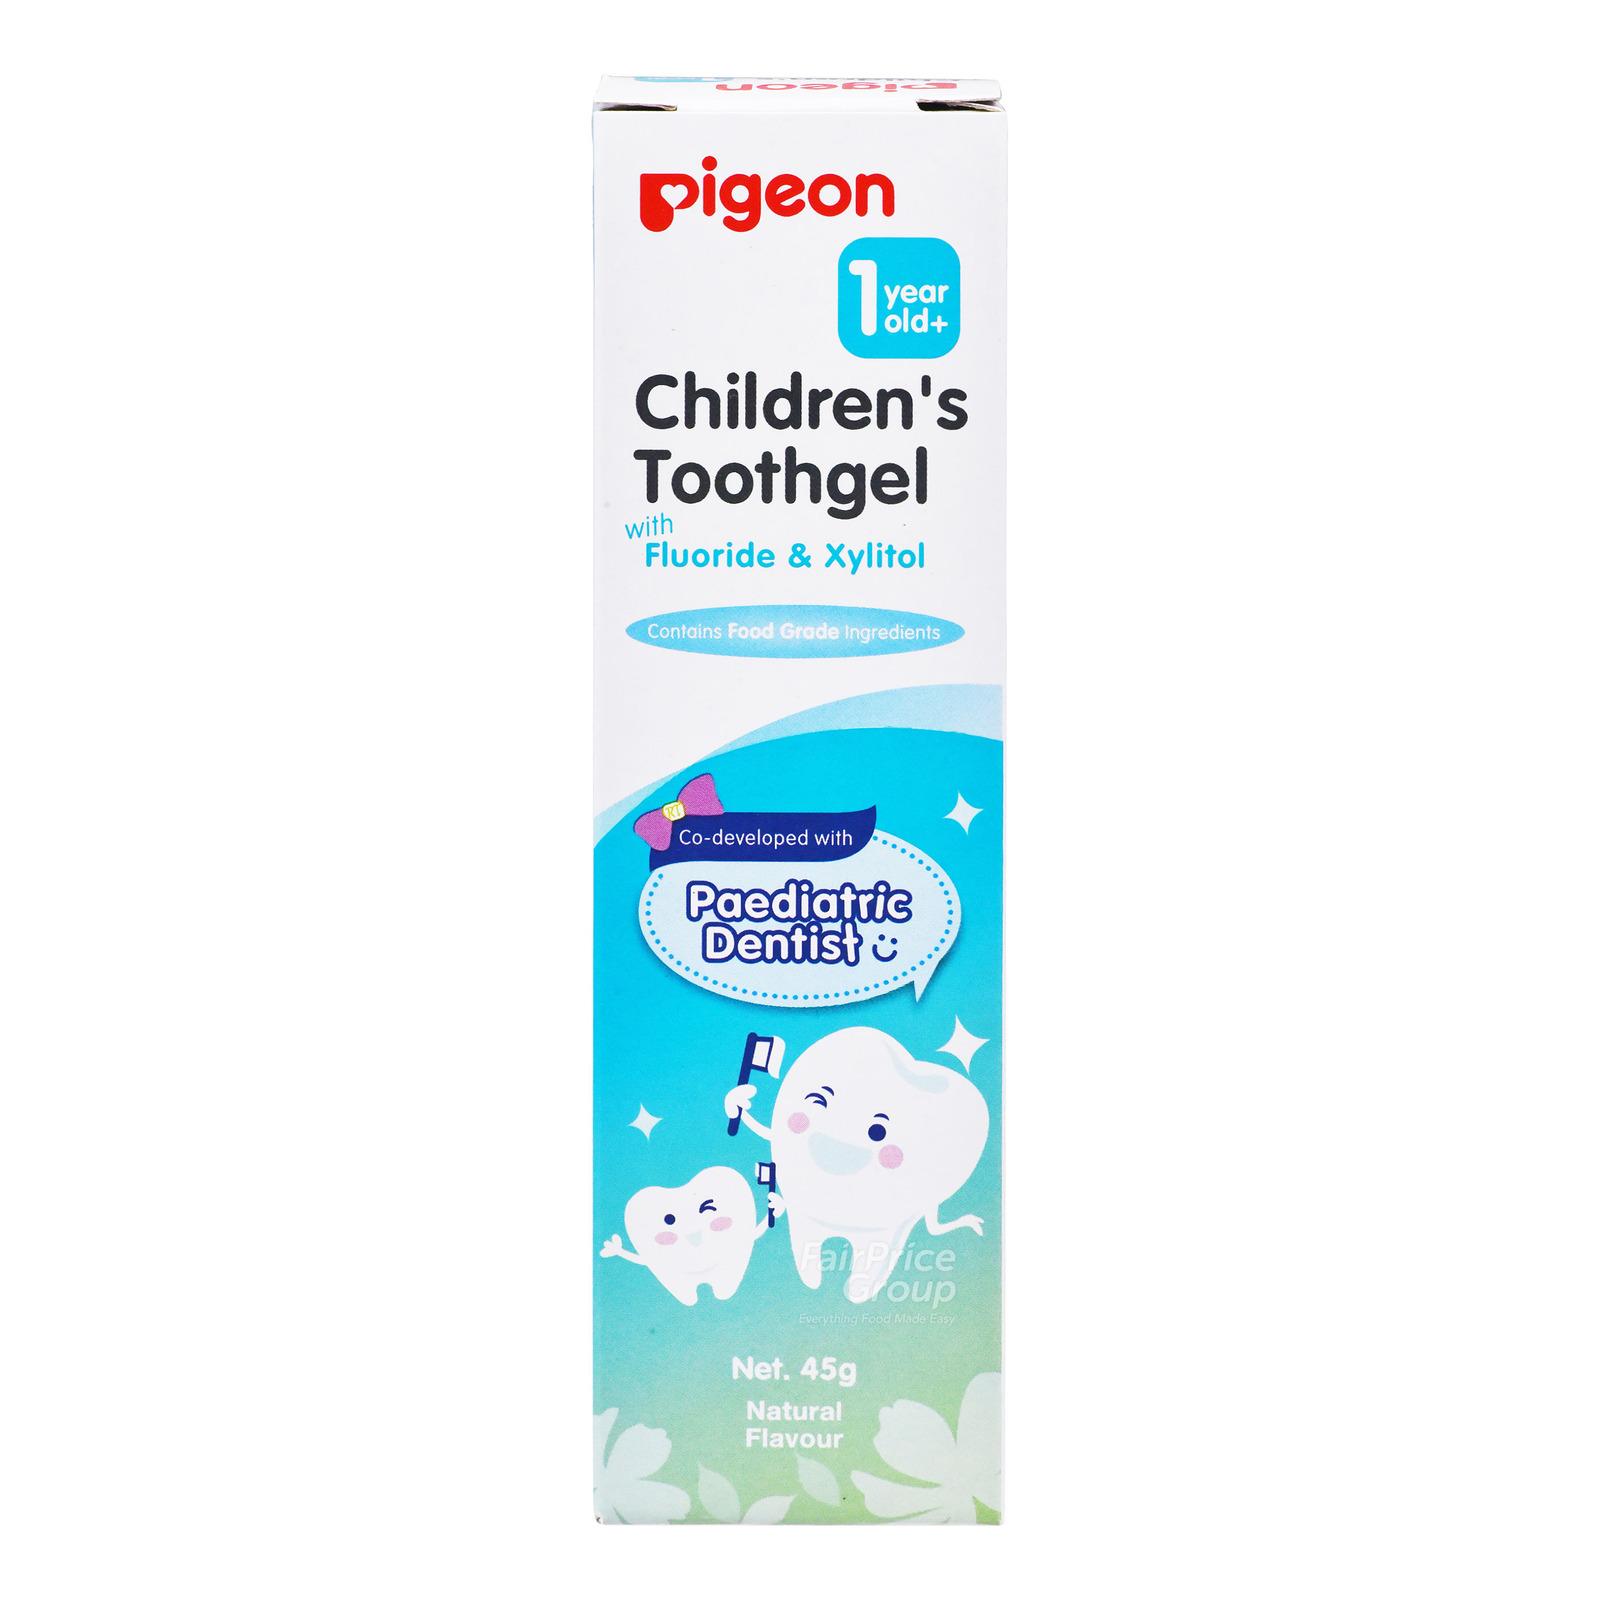 Pigeon Children's Toothgel - Natural